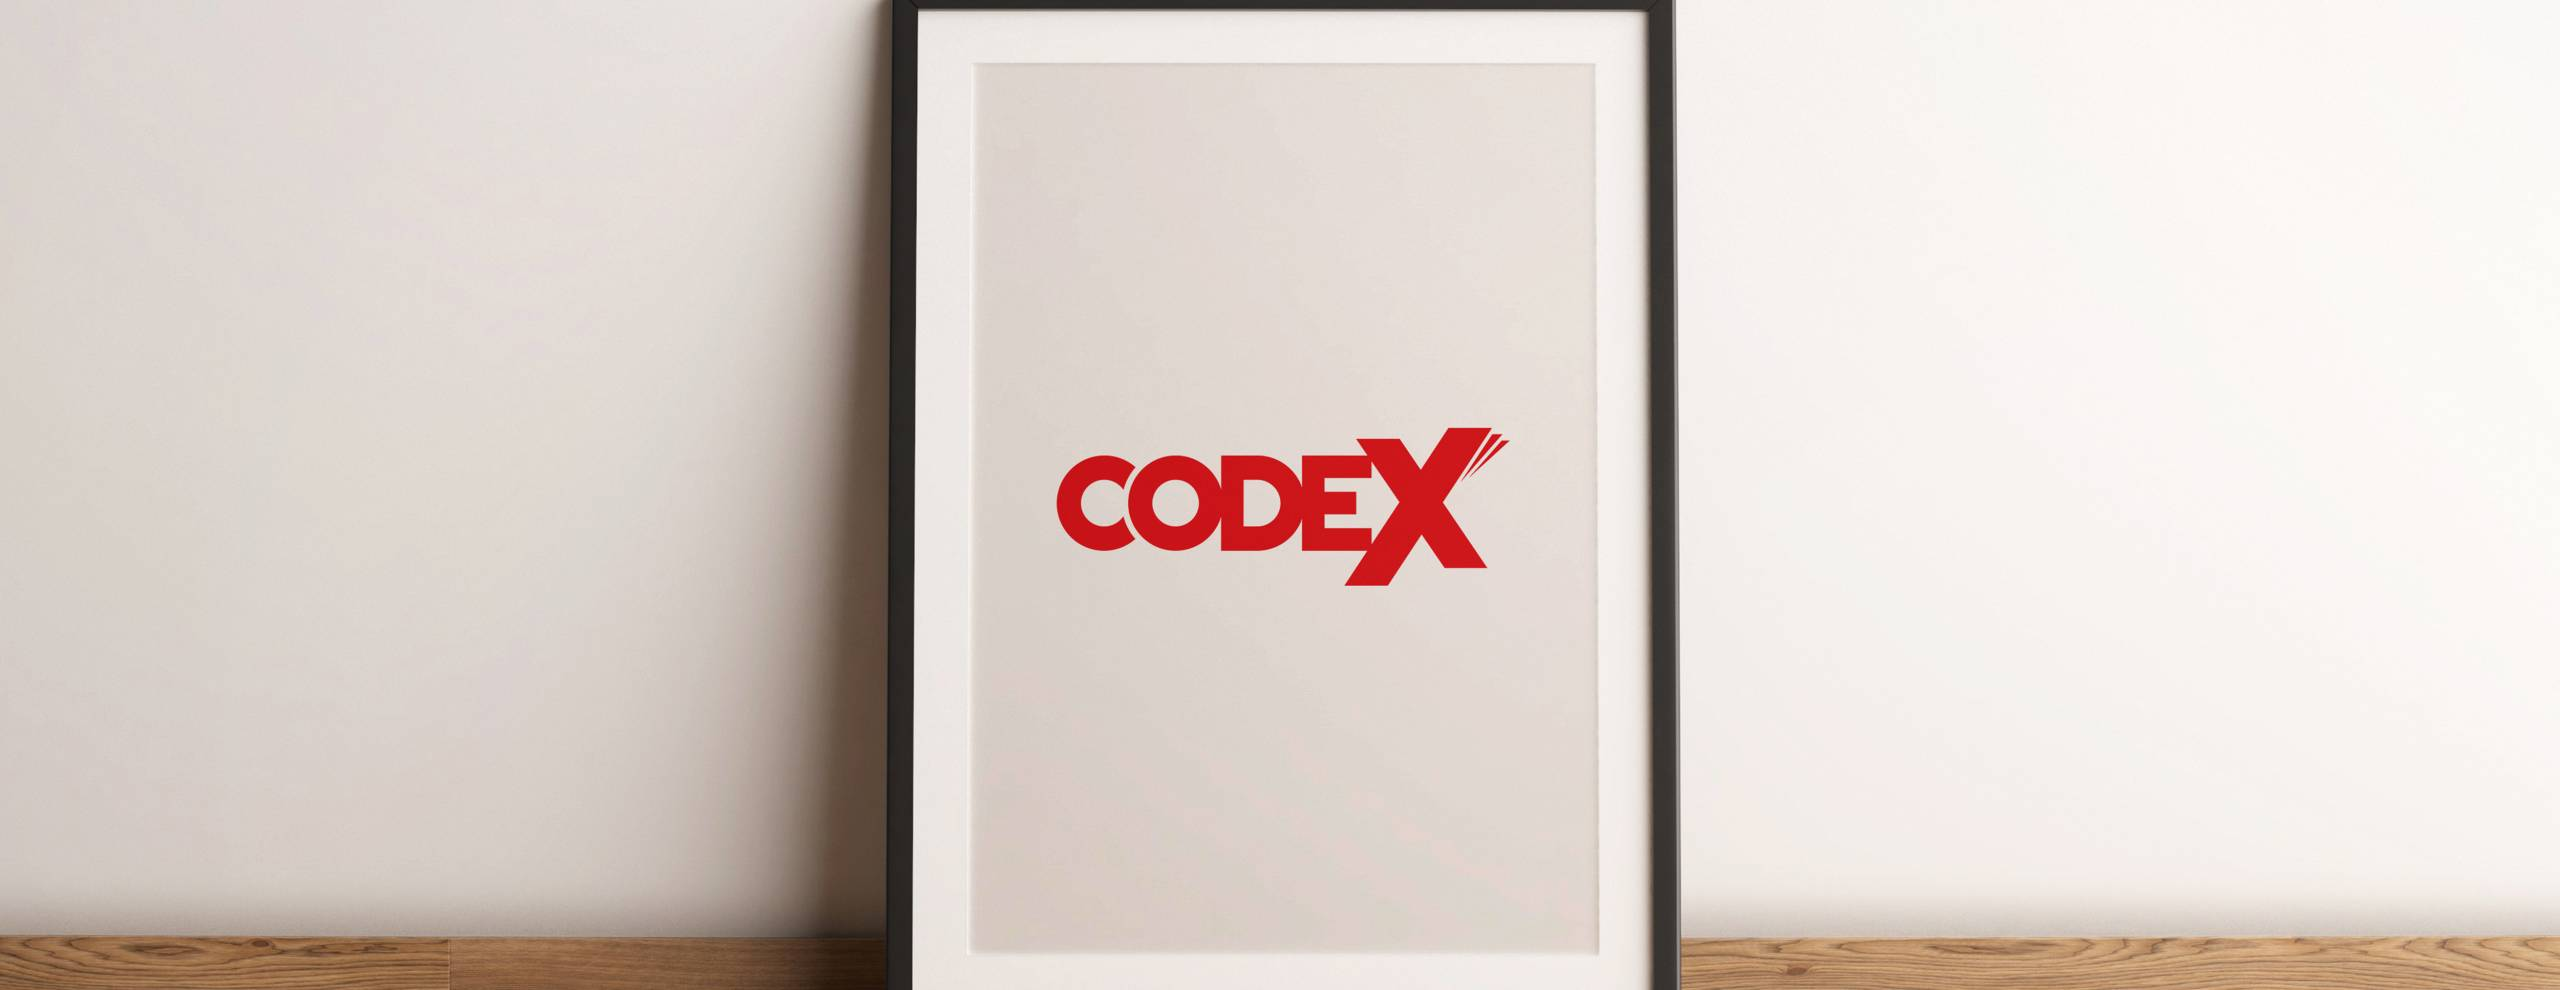 codex-8